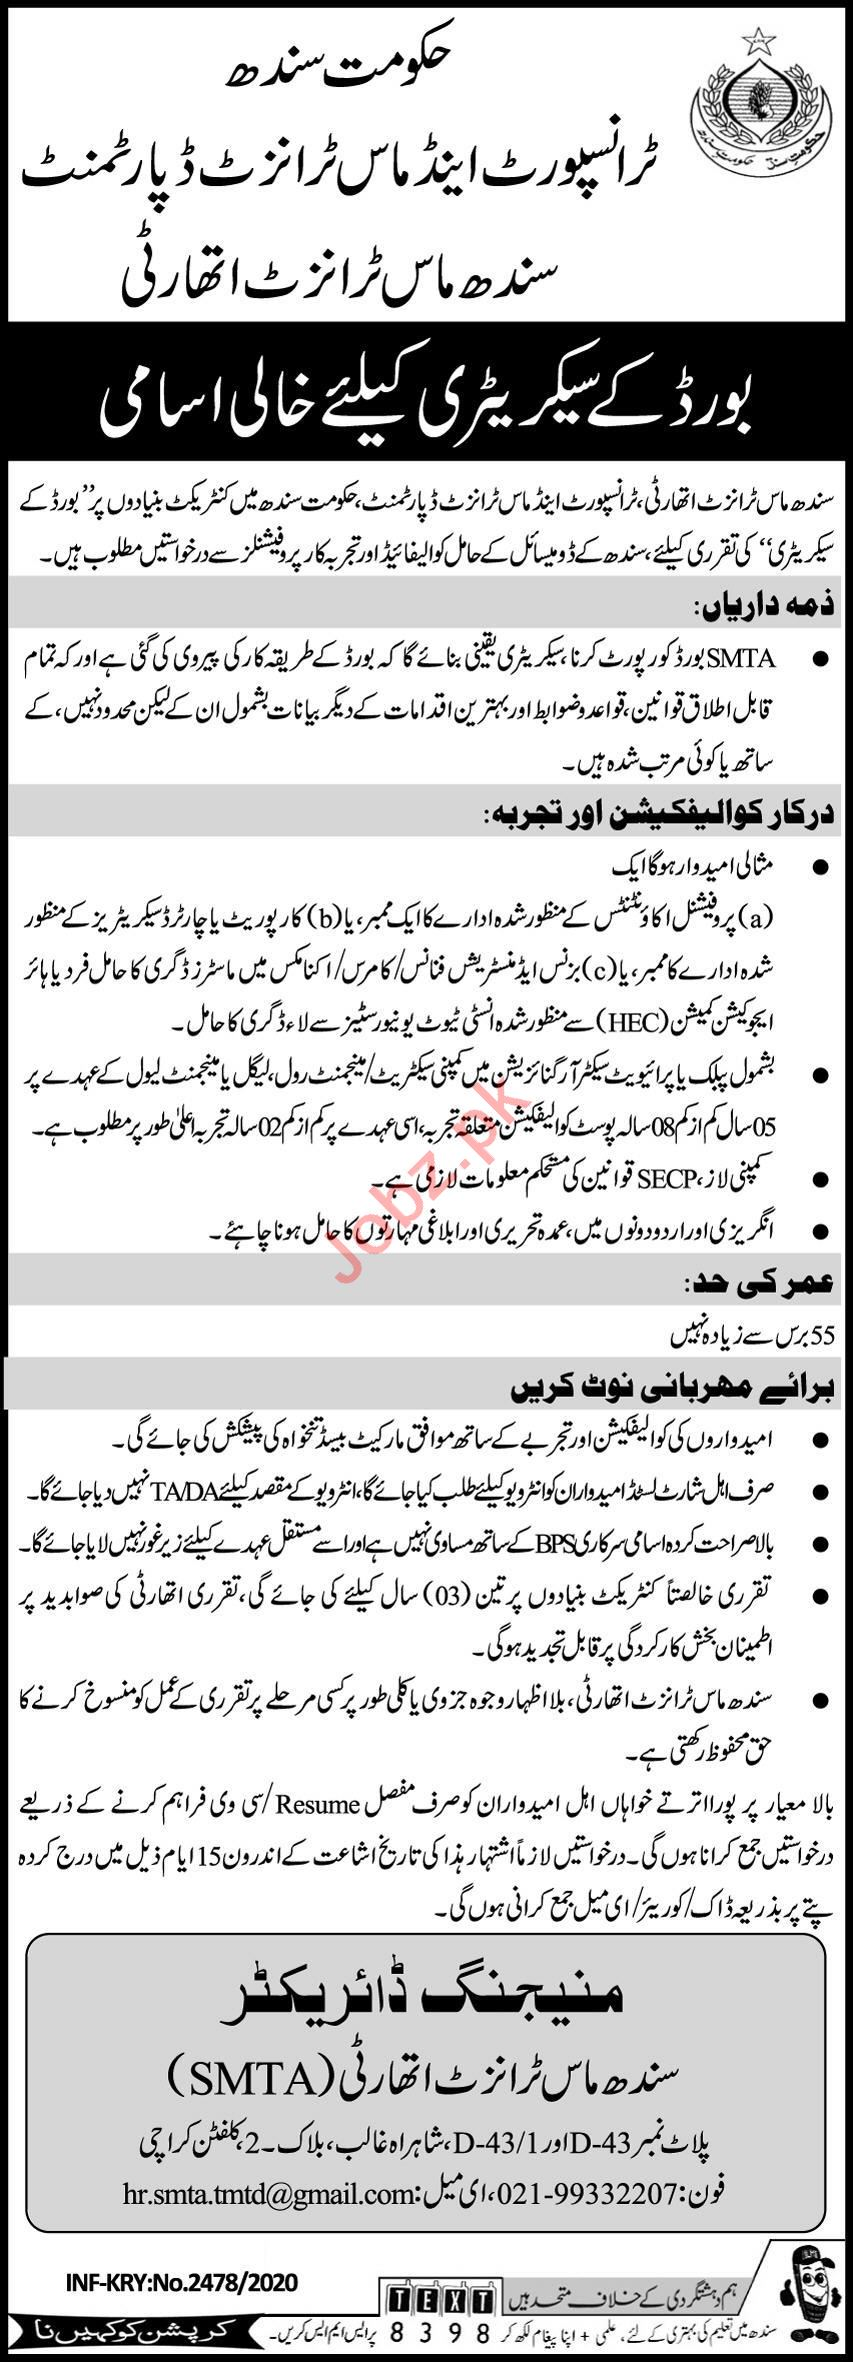 Sindh Mass Transit Authority SMTA Jobs 2020 for Secretary